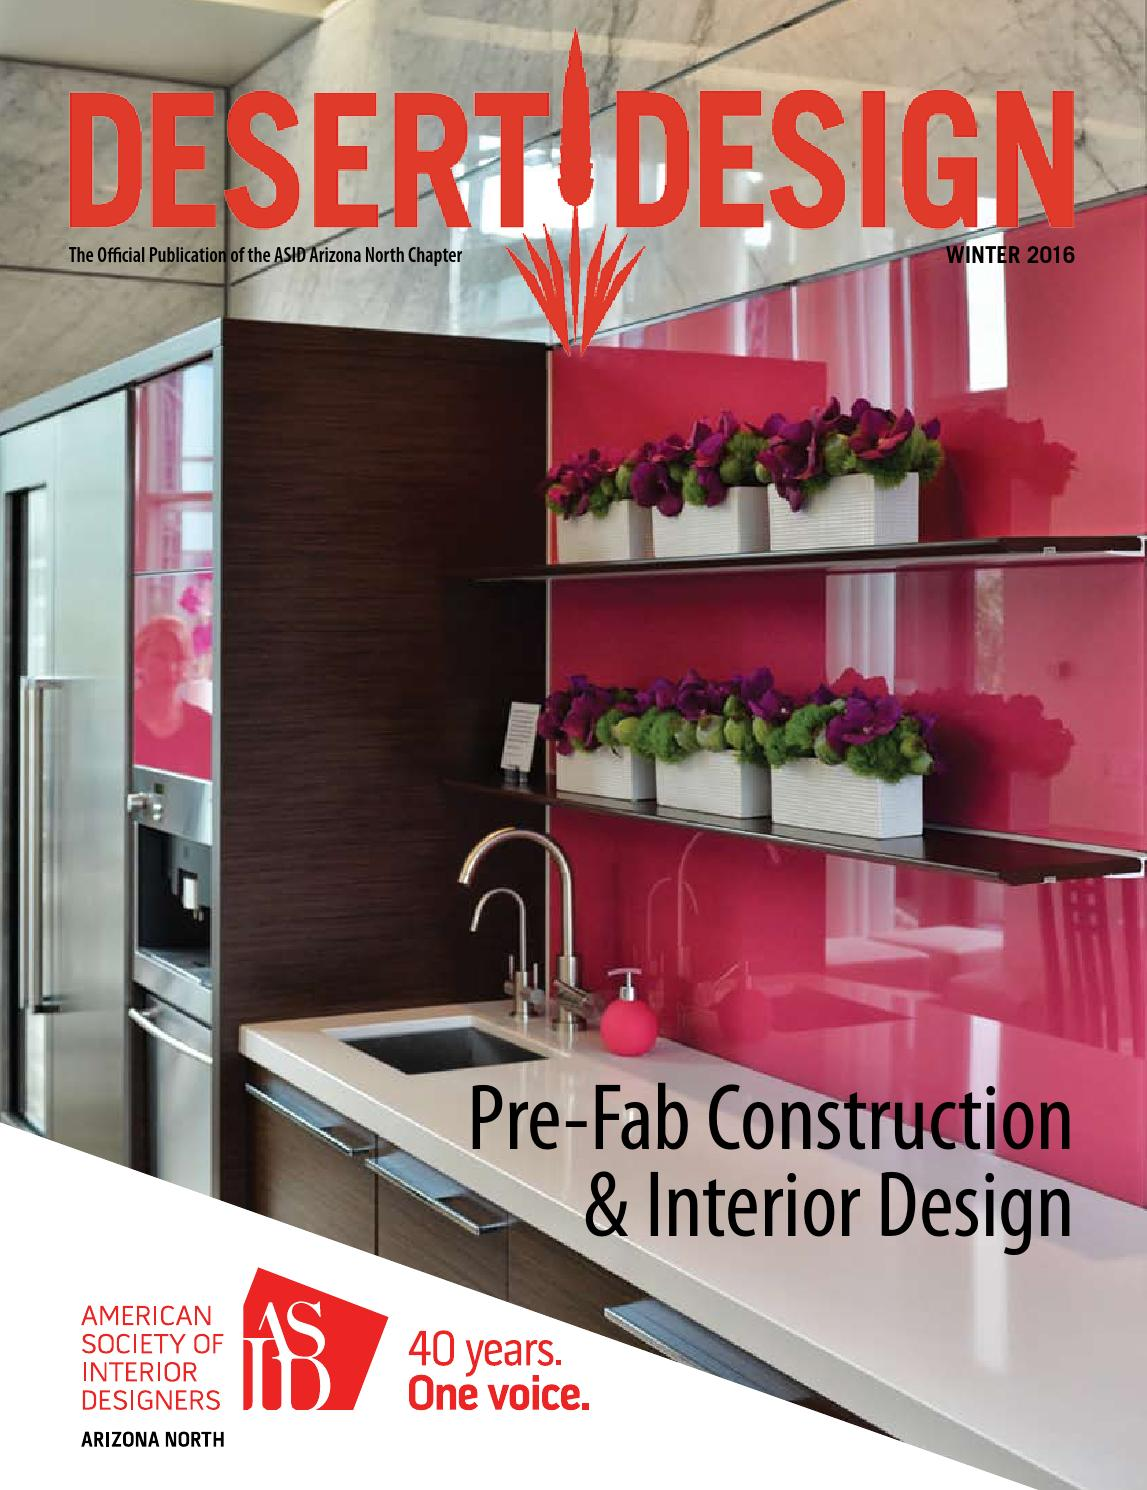 Desert Design Magazine Winter 2016 By Arizona North